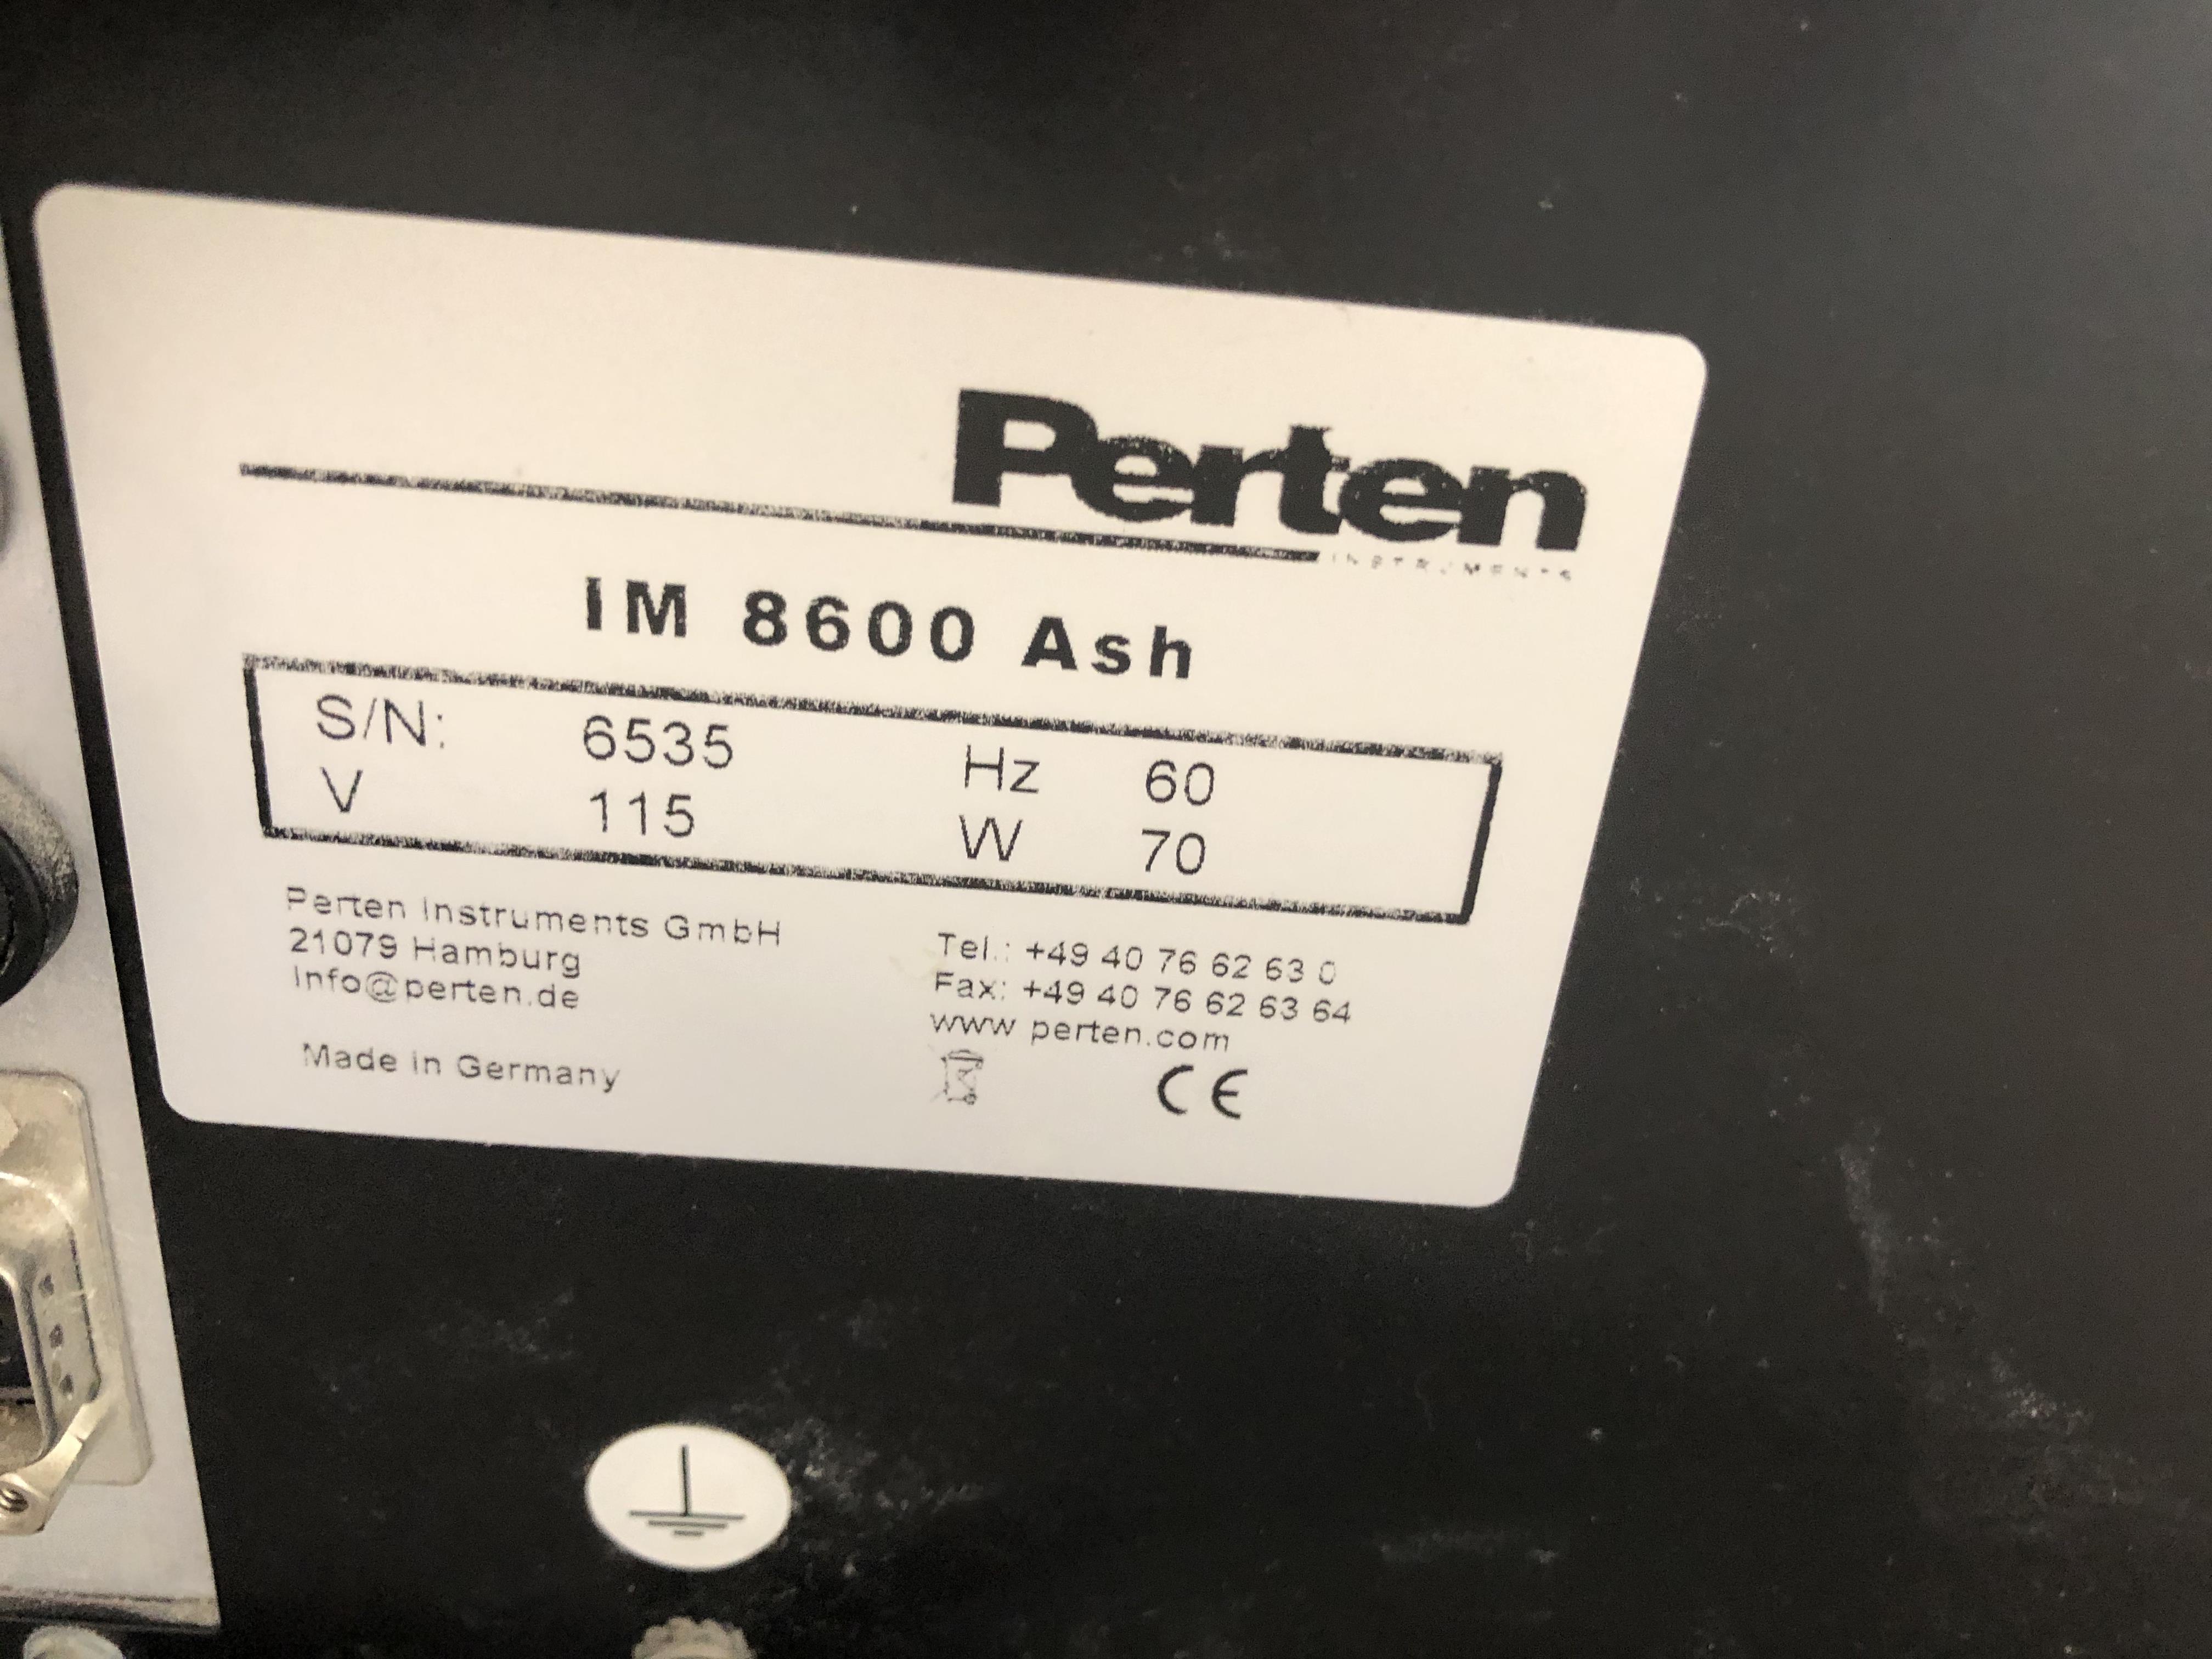 Perten IM 8600 Ash, Serial# 6535 - Image 2 of 3